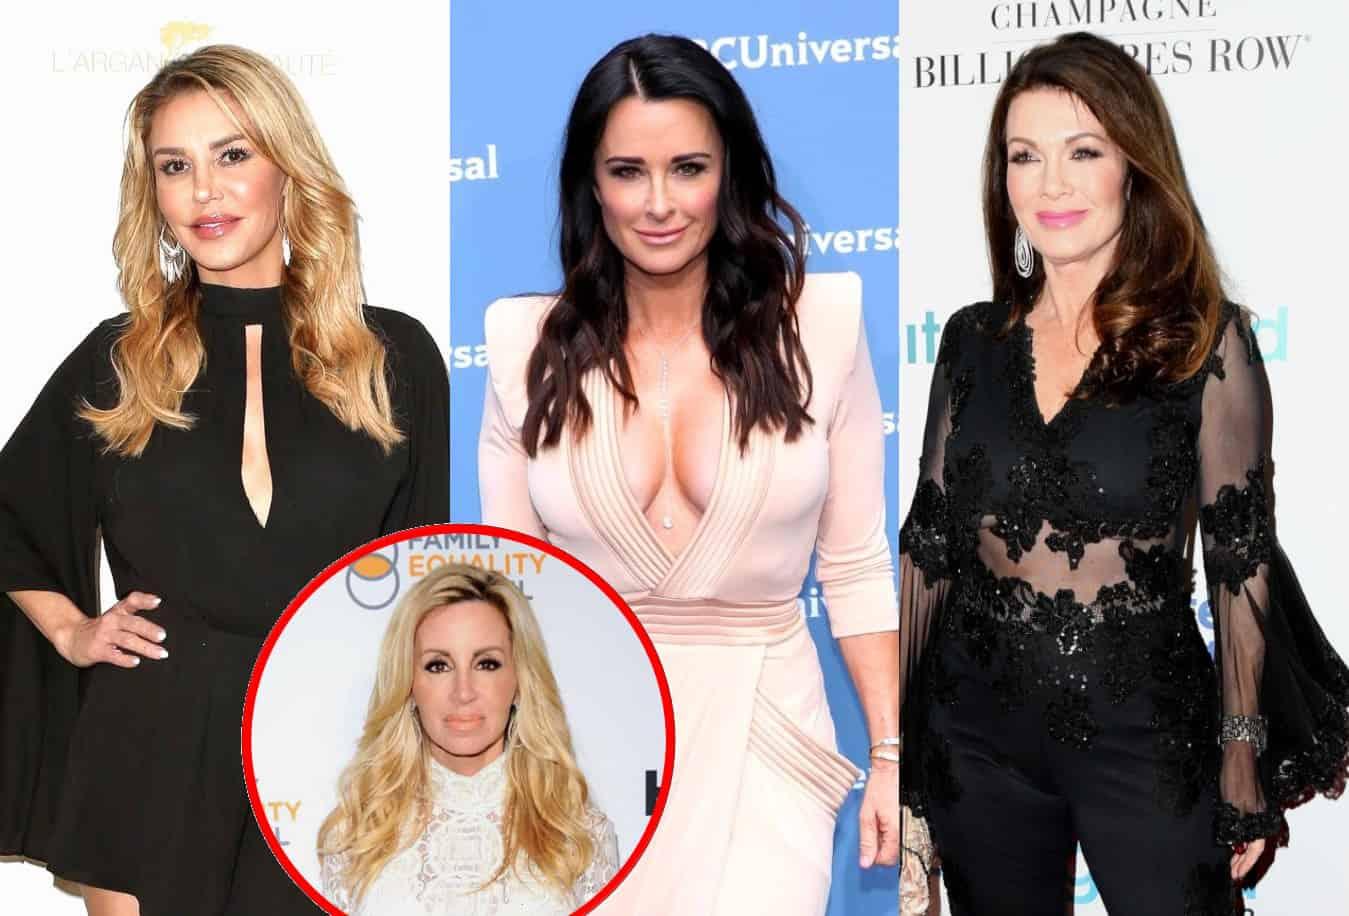 Brandi Glanville Denies Kyle Richards Brought Her Back to RHOBH to Spark Drama With Lisa Vanderpump, Blasts Camille Grammer